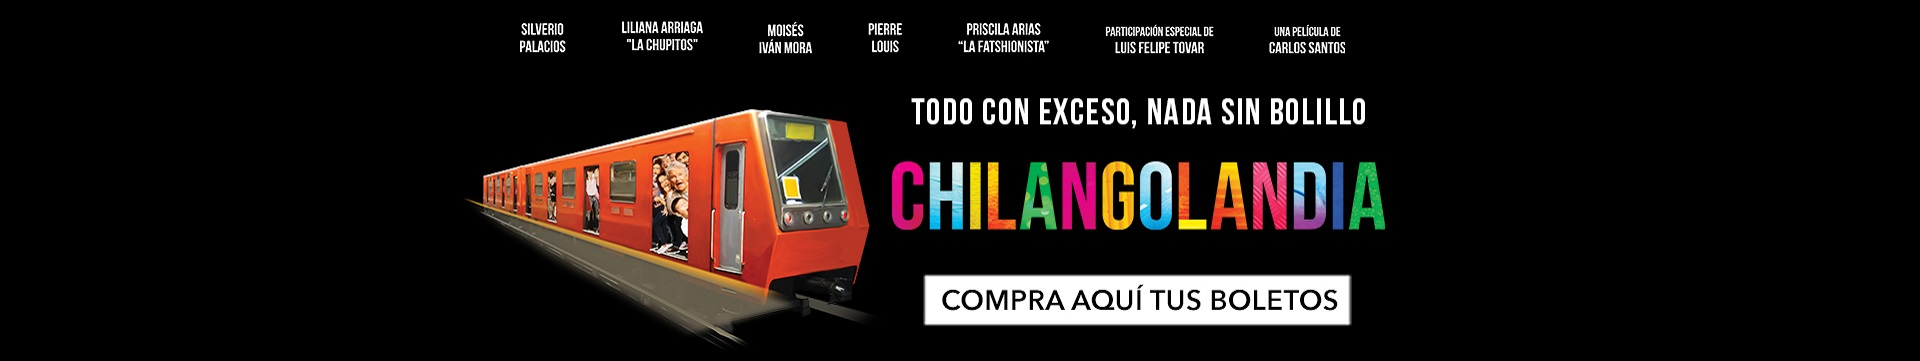 Chilangolandia